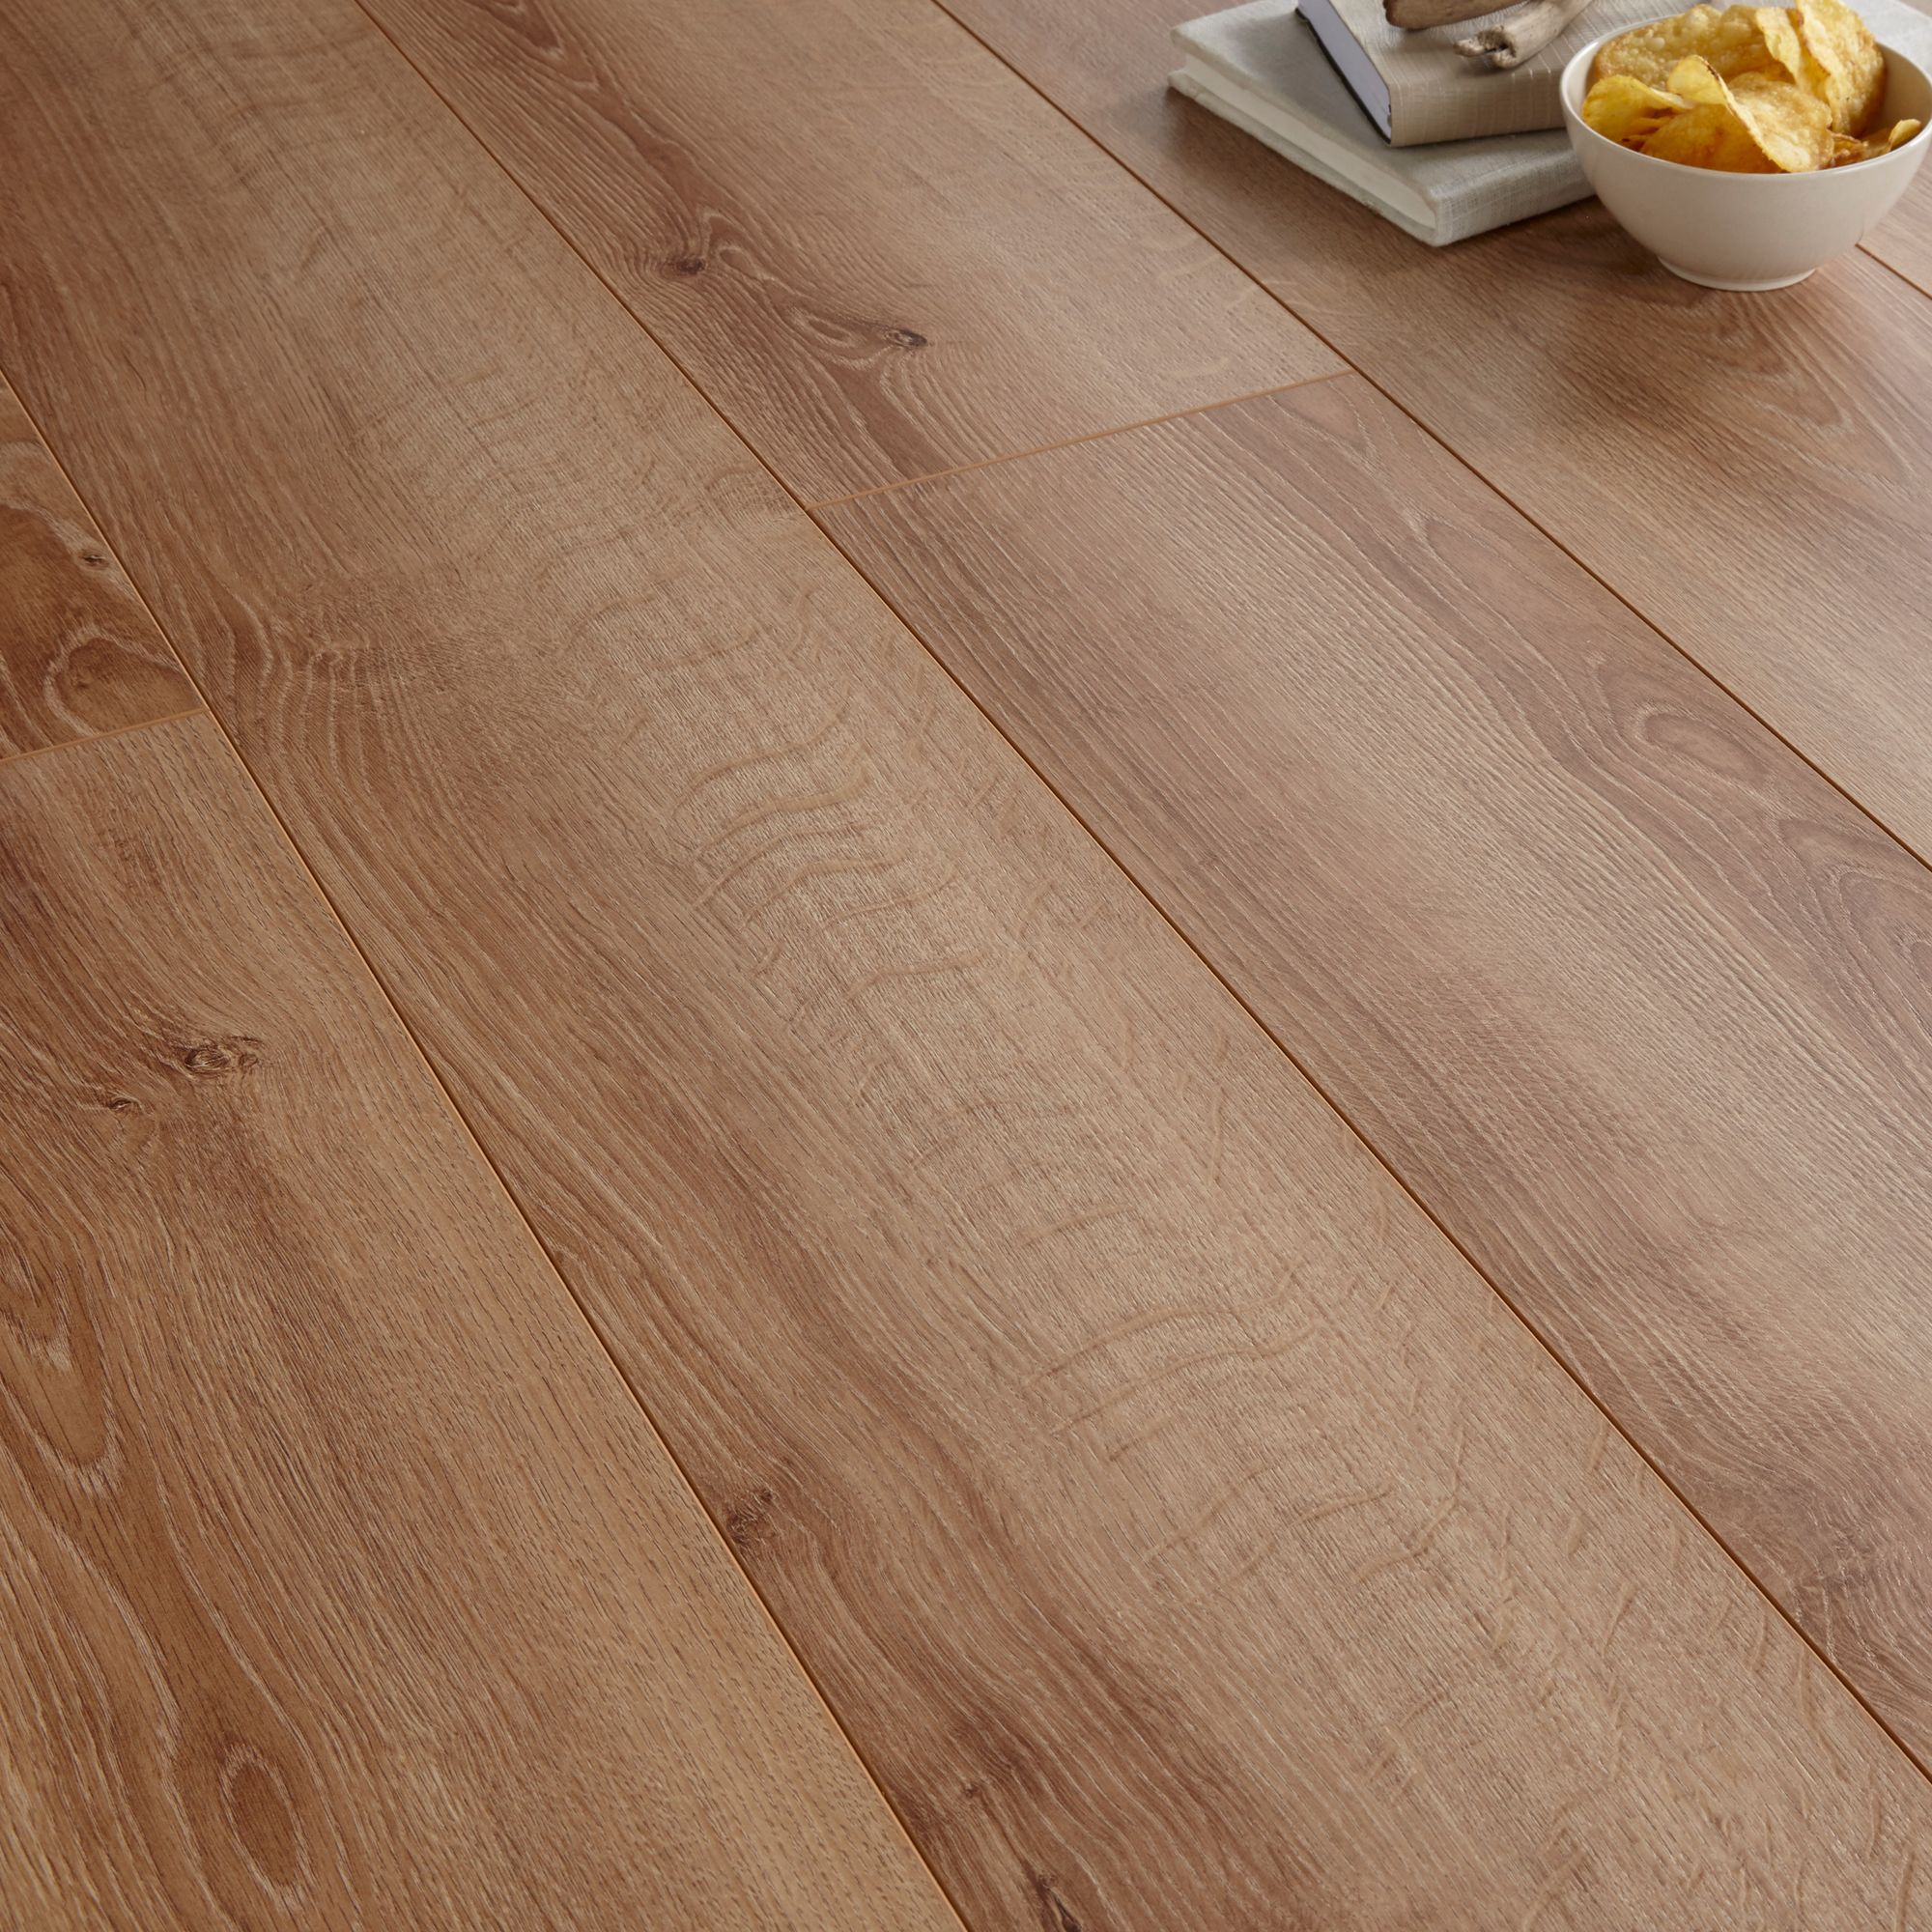 Bq Kitchen Laminate Flooring Natural Oak Effect Laminate Flooring 175 Ma2 Pack Departments